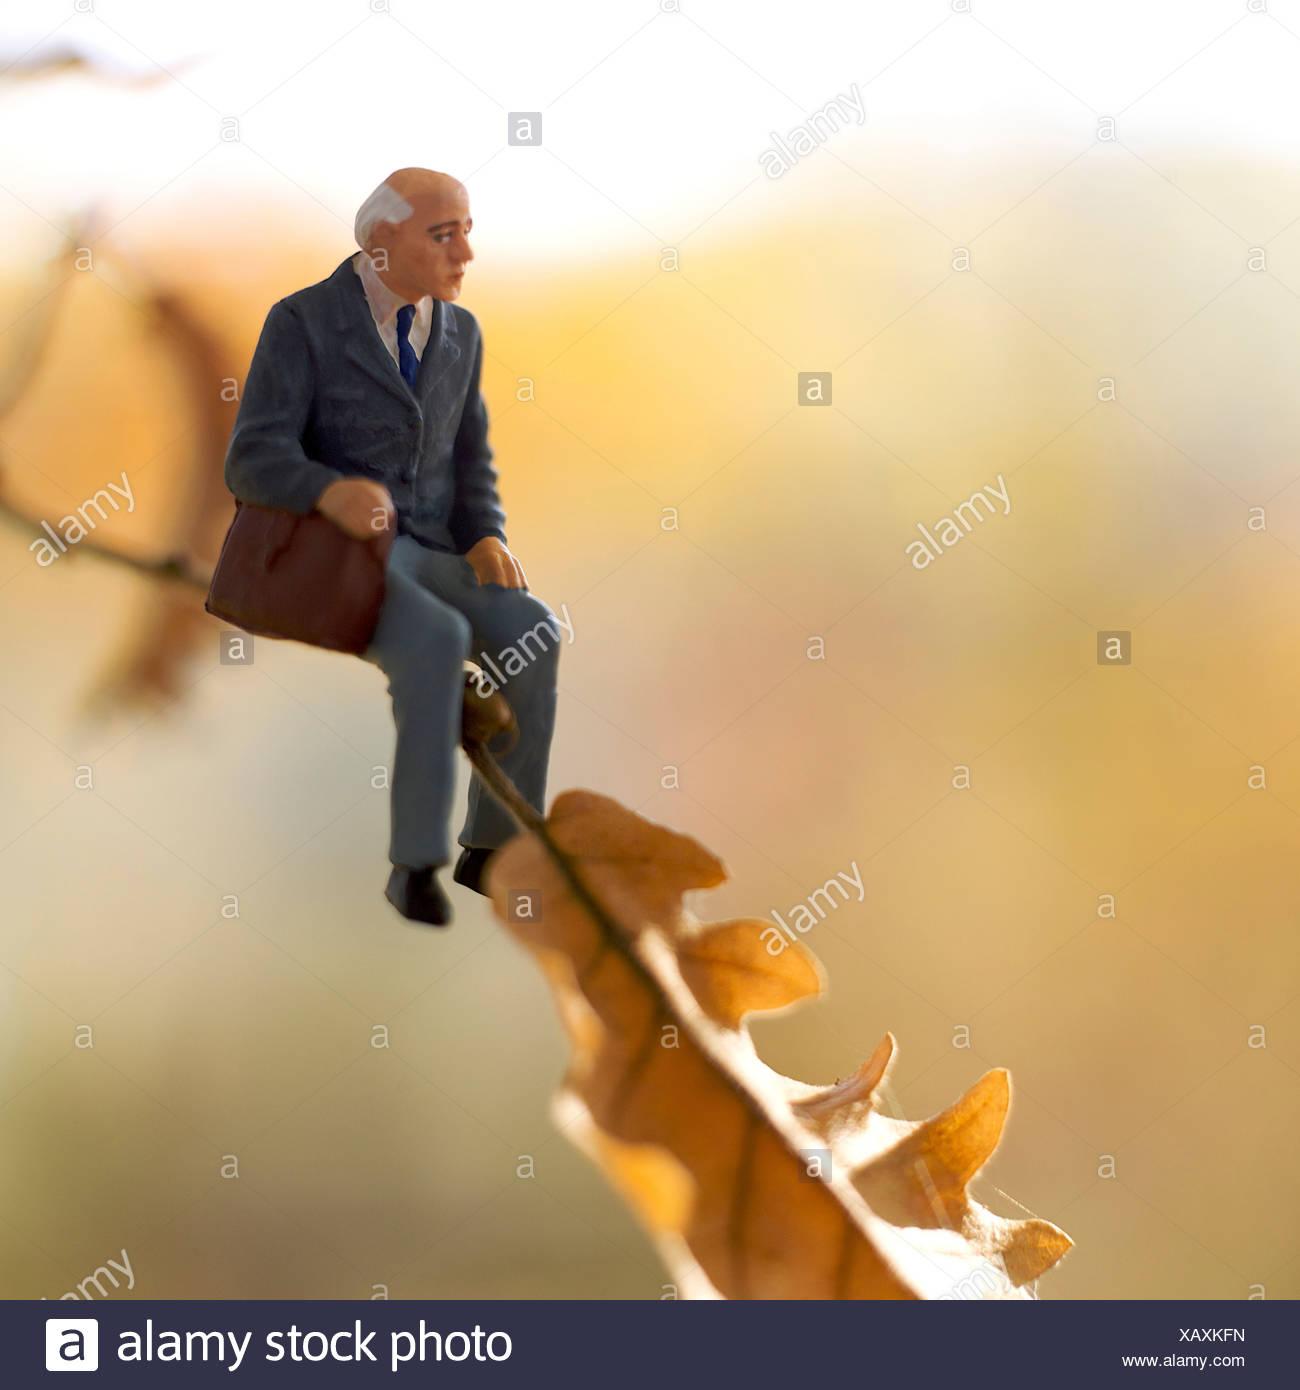 Solitary elderly male figure sitting alone - Stock Image